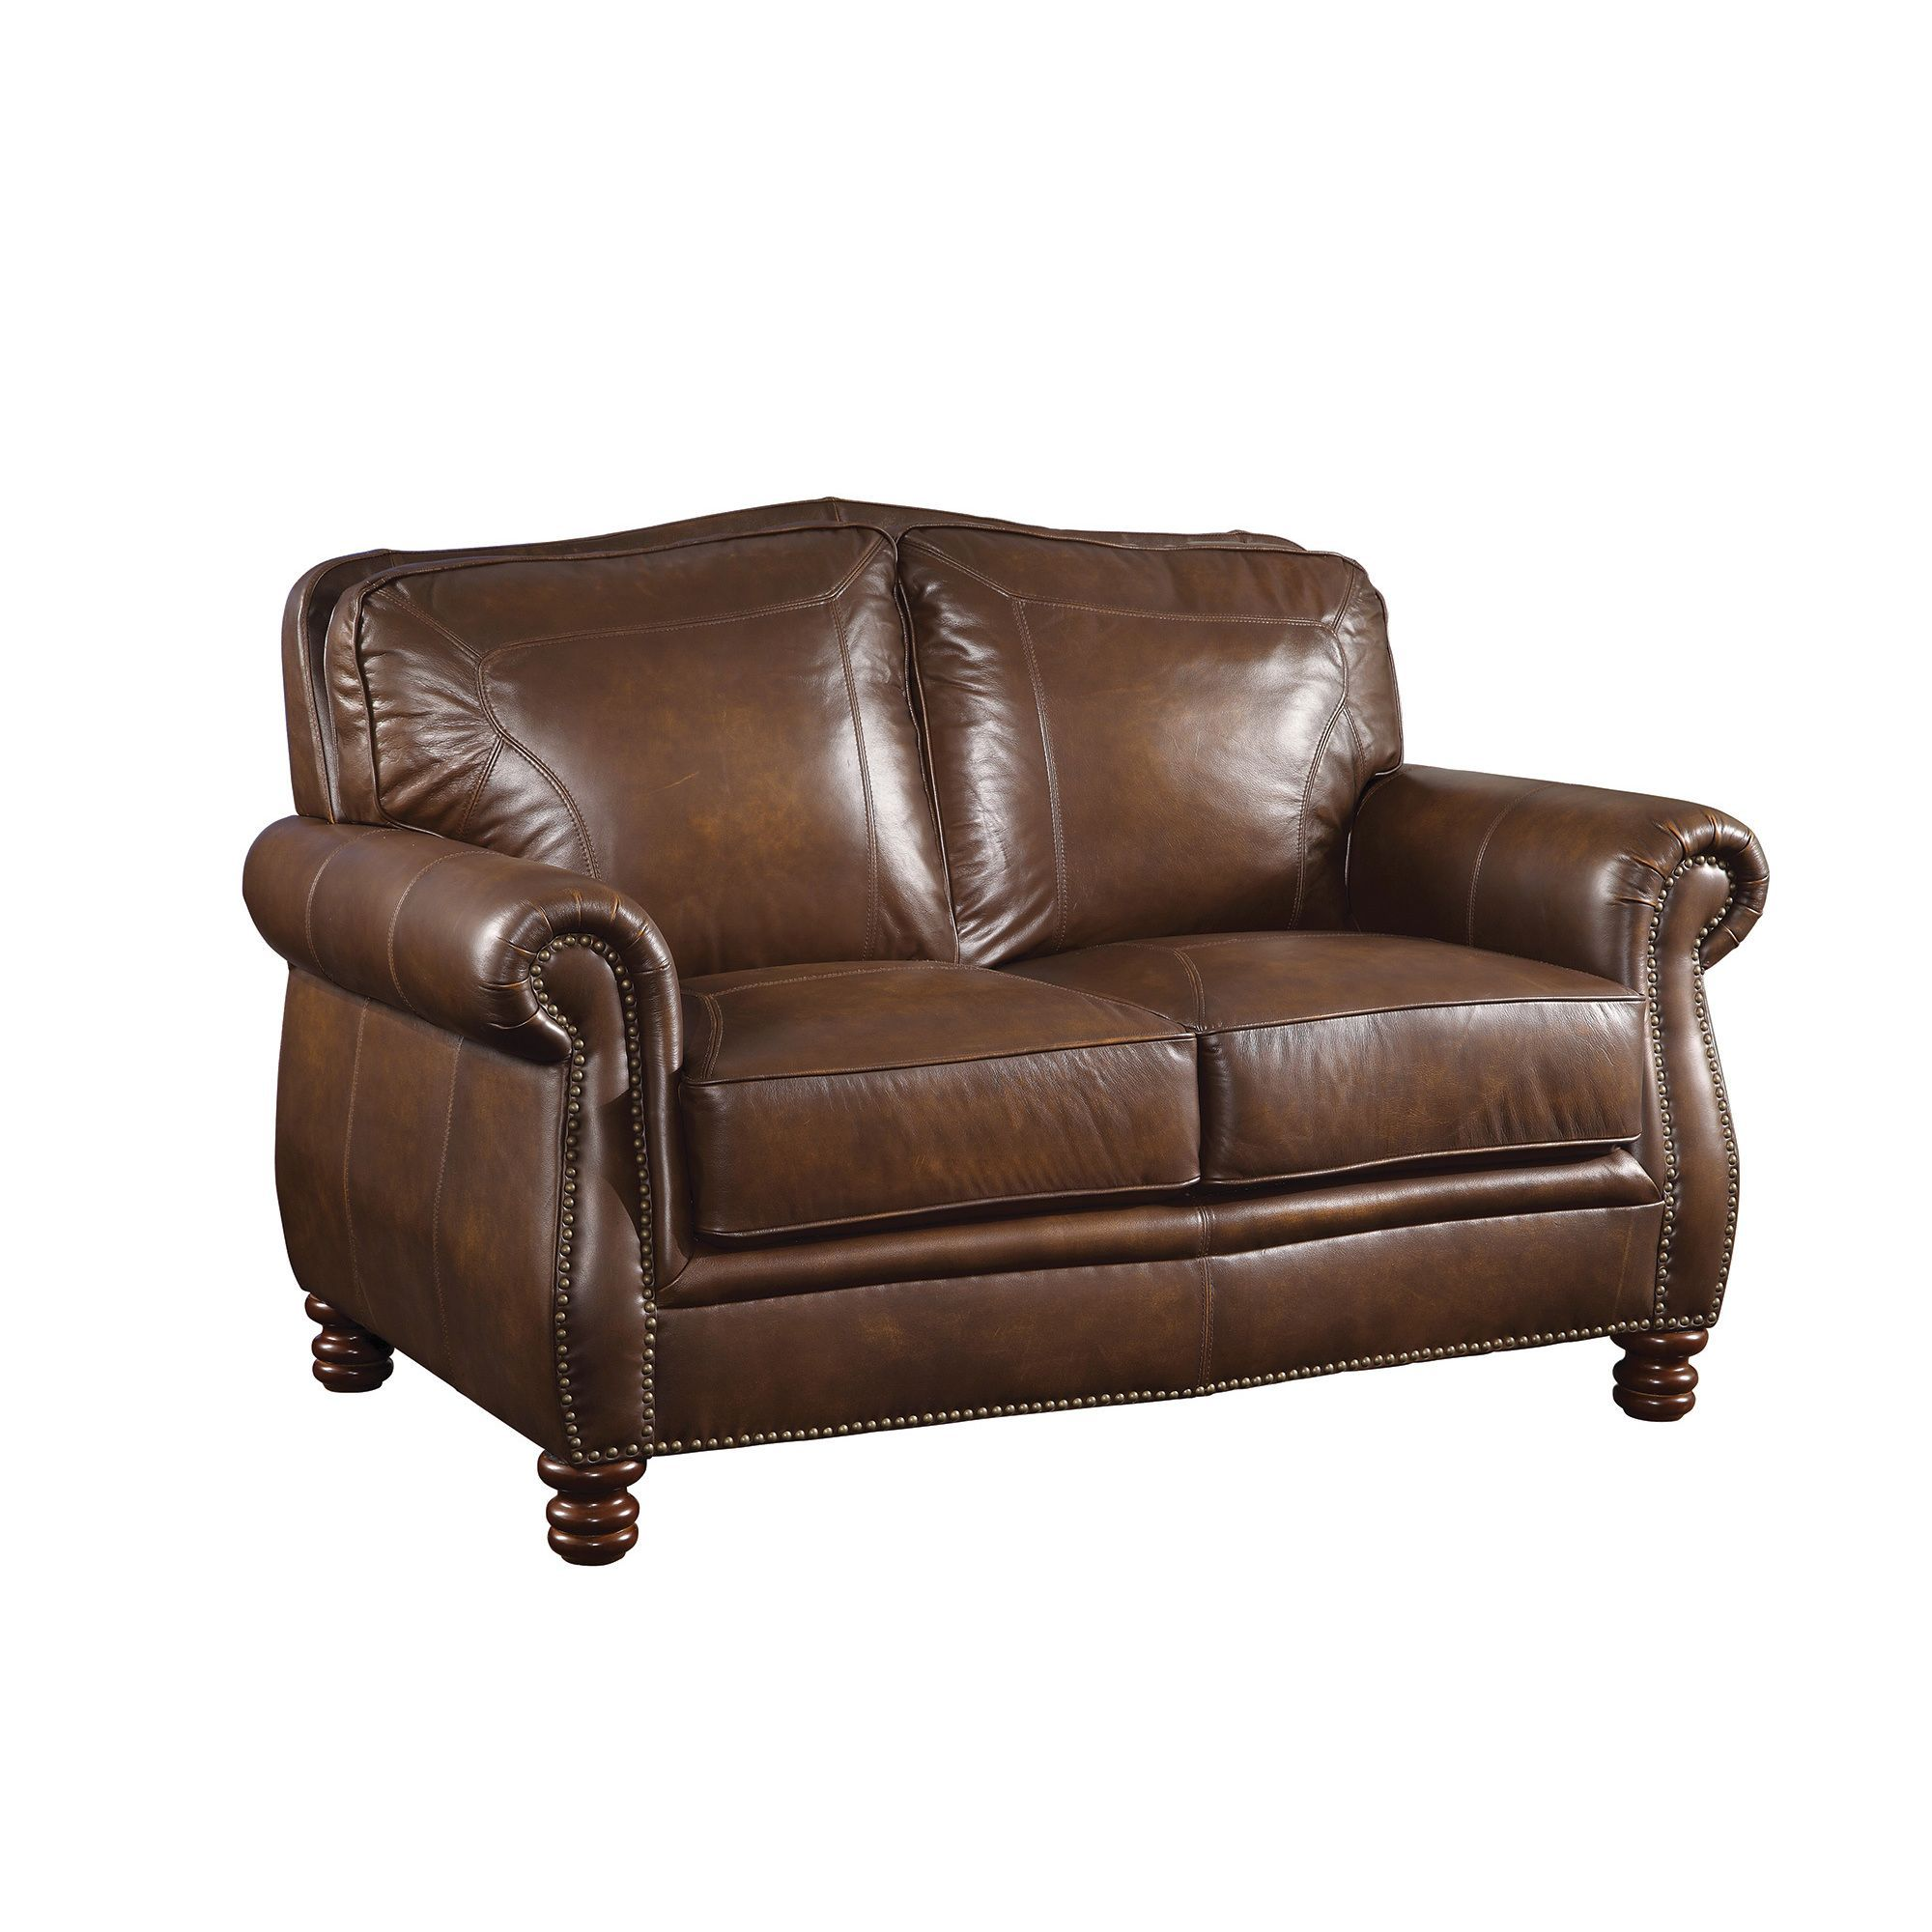 Coaster Company Nailhead Trim Brown Leather Sofa (Loveseat)